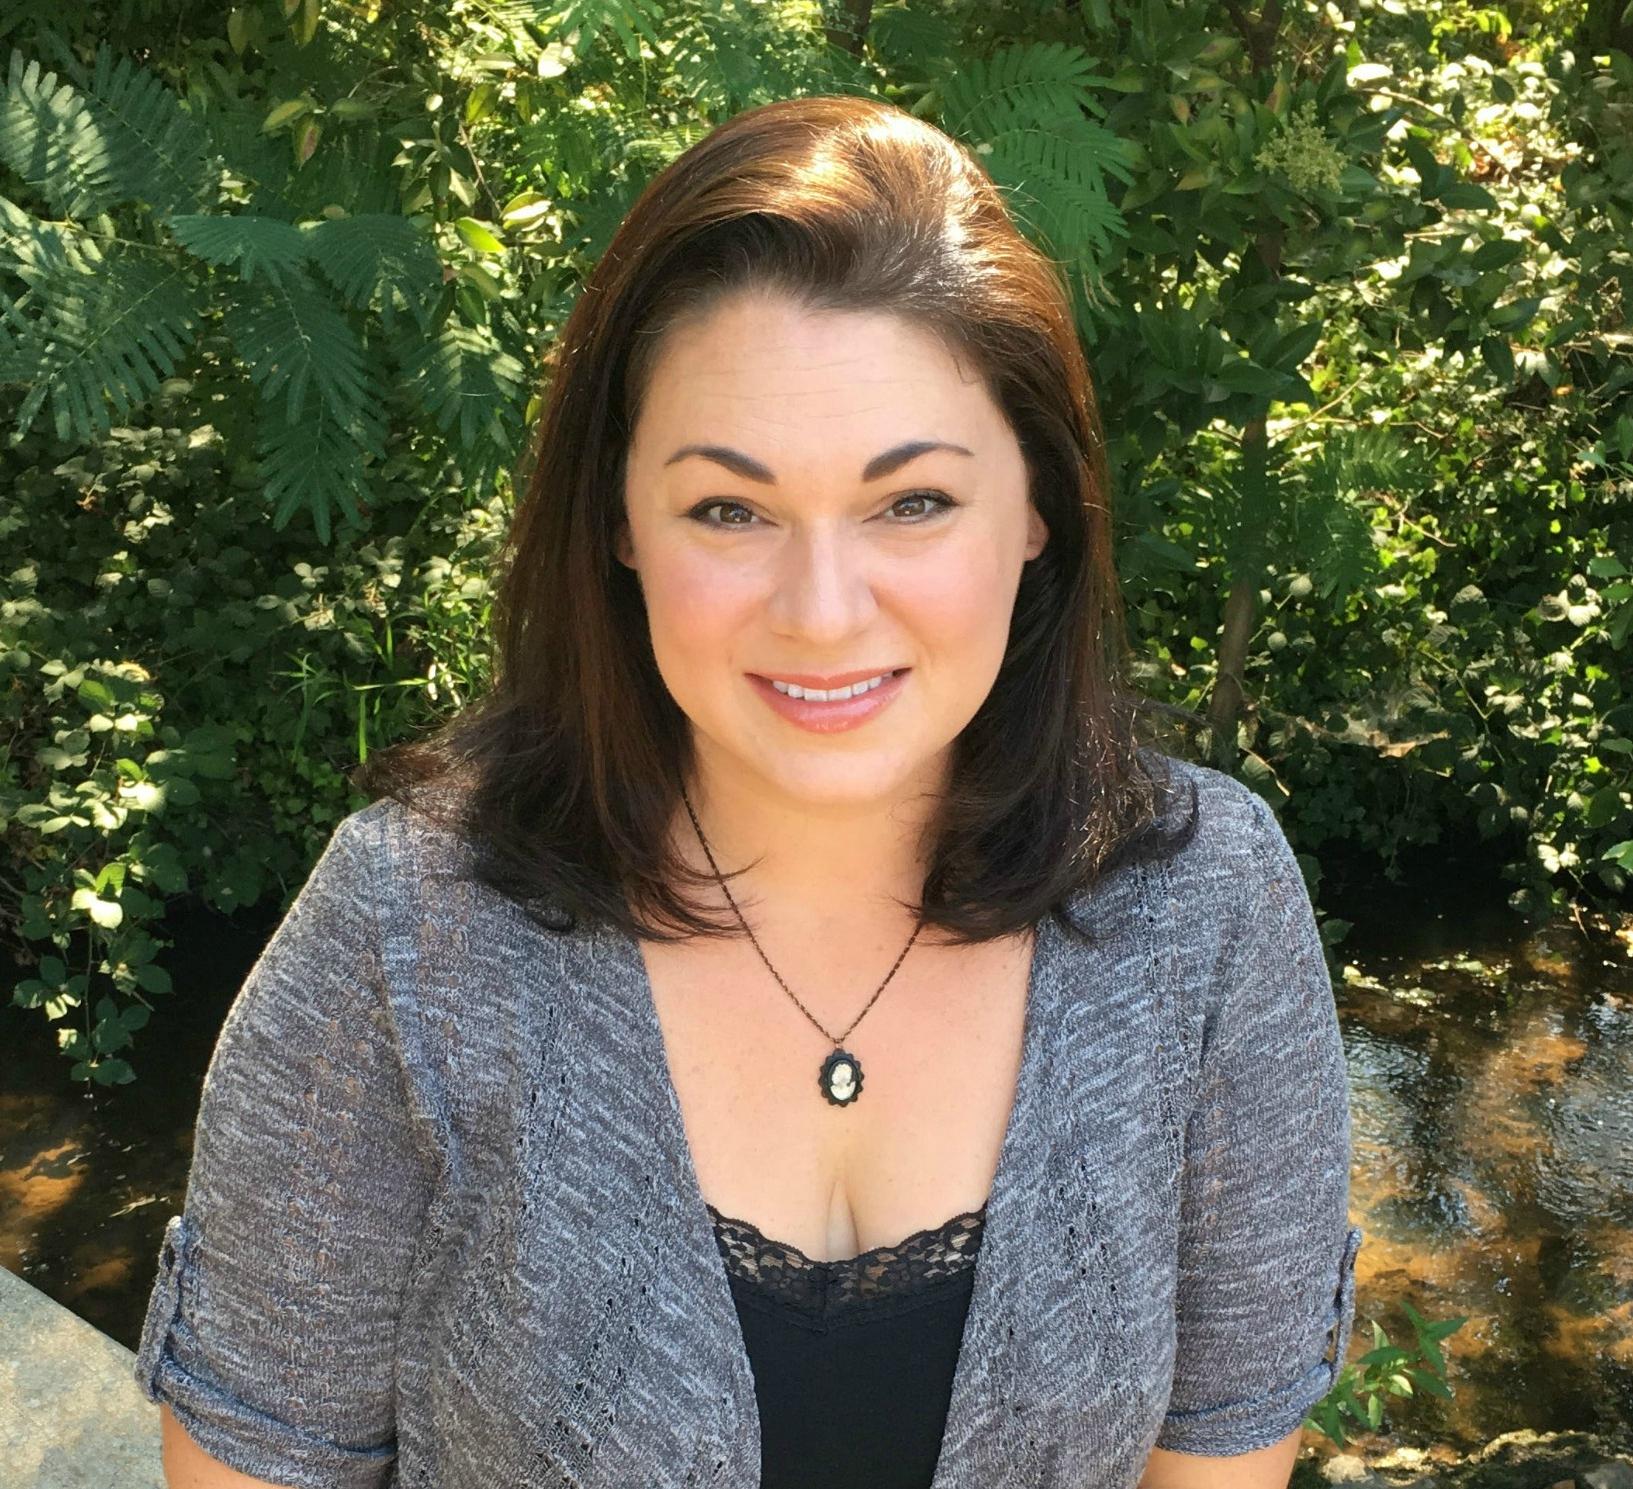 Shelley Cavanna